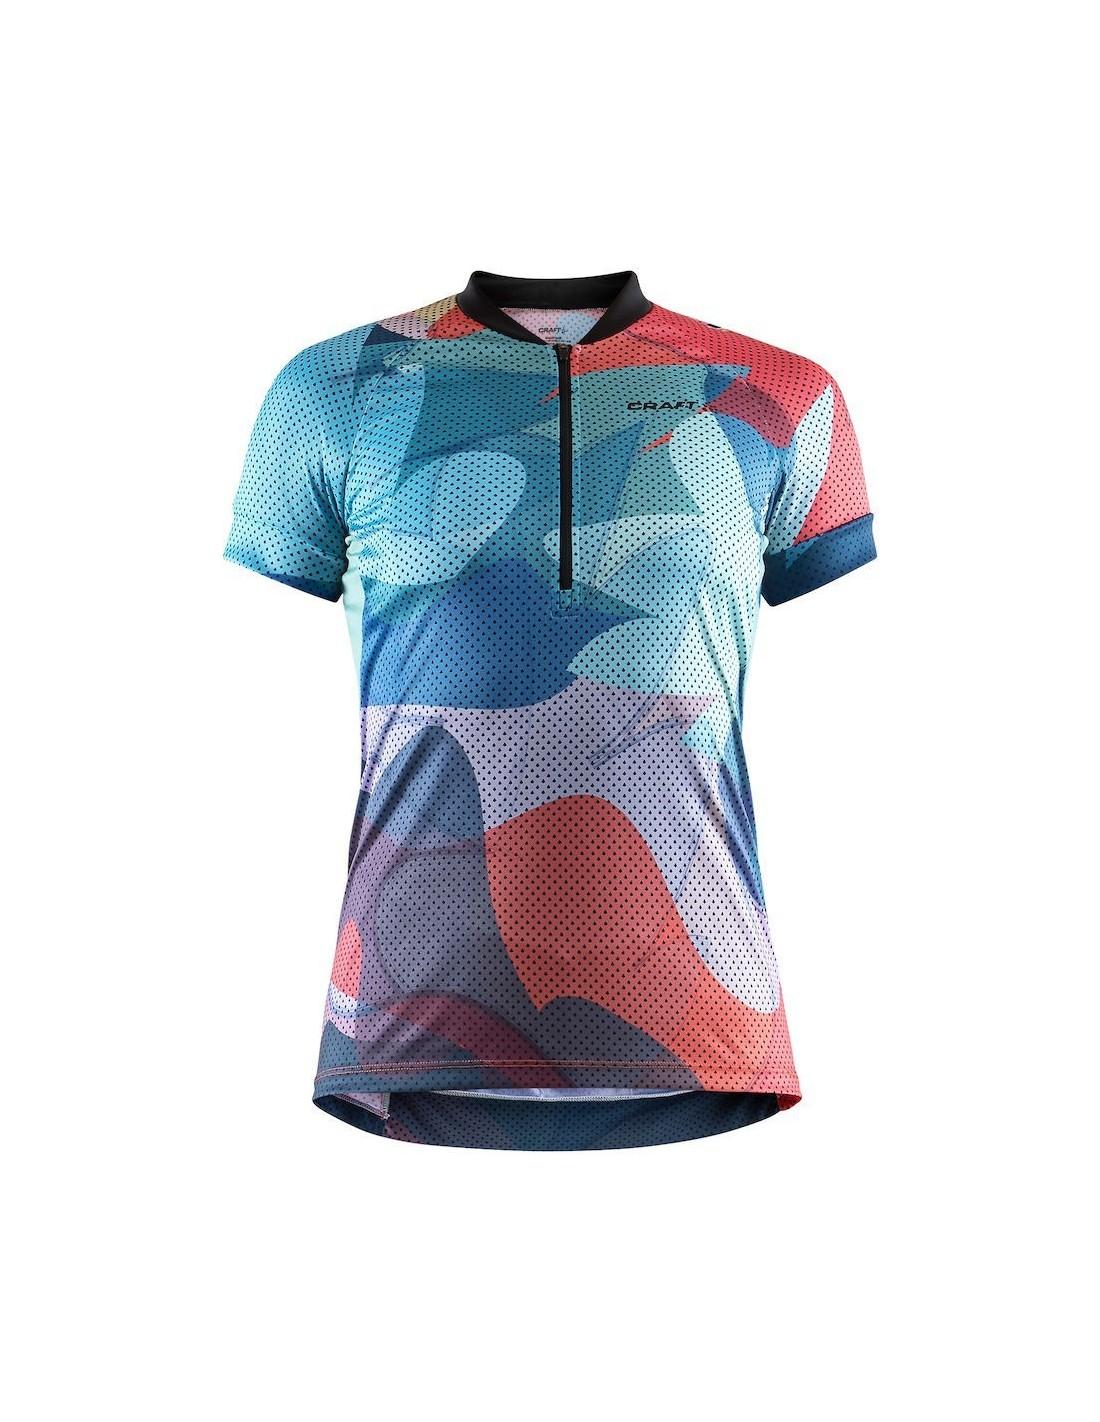 ccd2cf6403658 Koszulka rowerowa damska Craft Velo Art Jersey, niebieska - STSklep